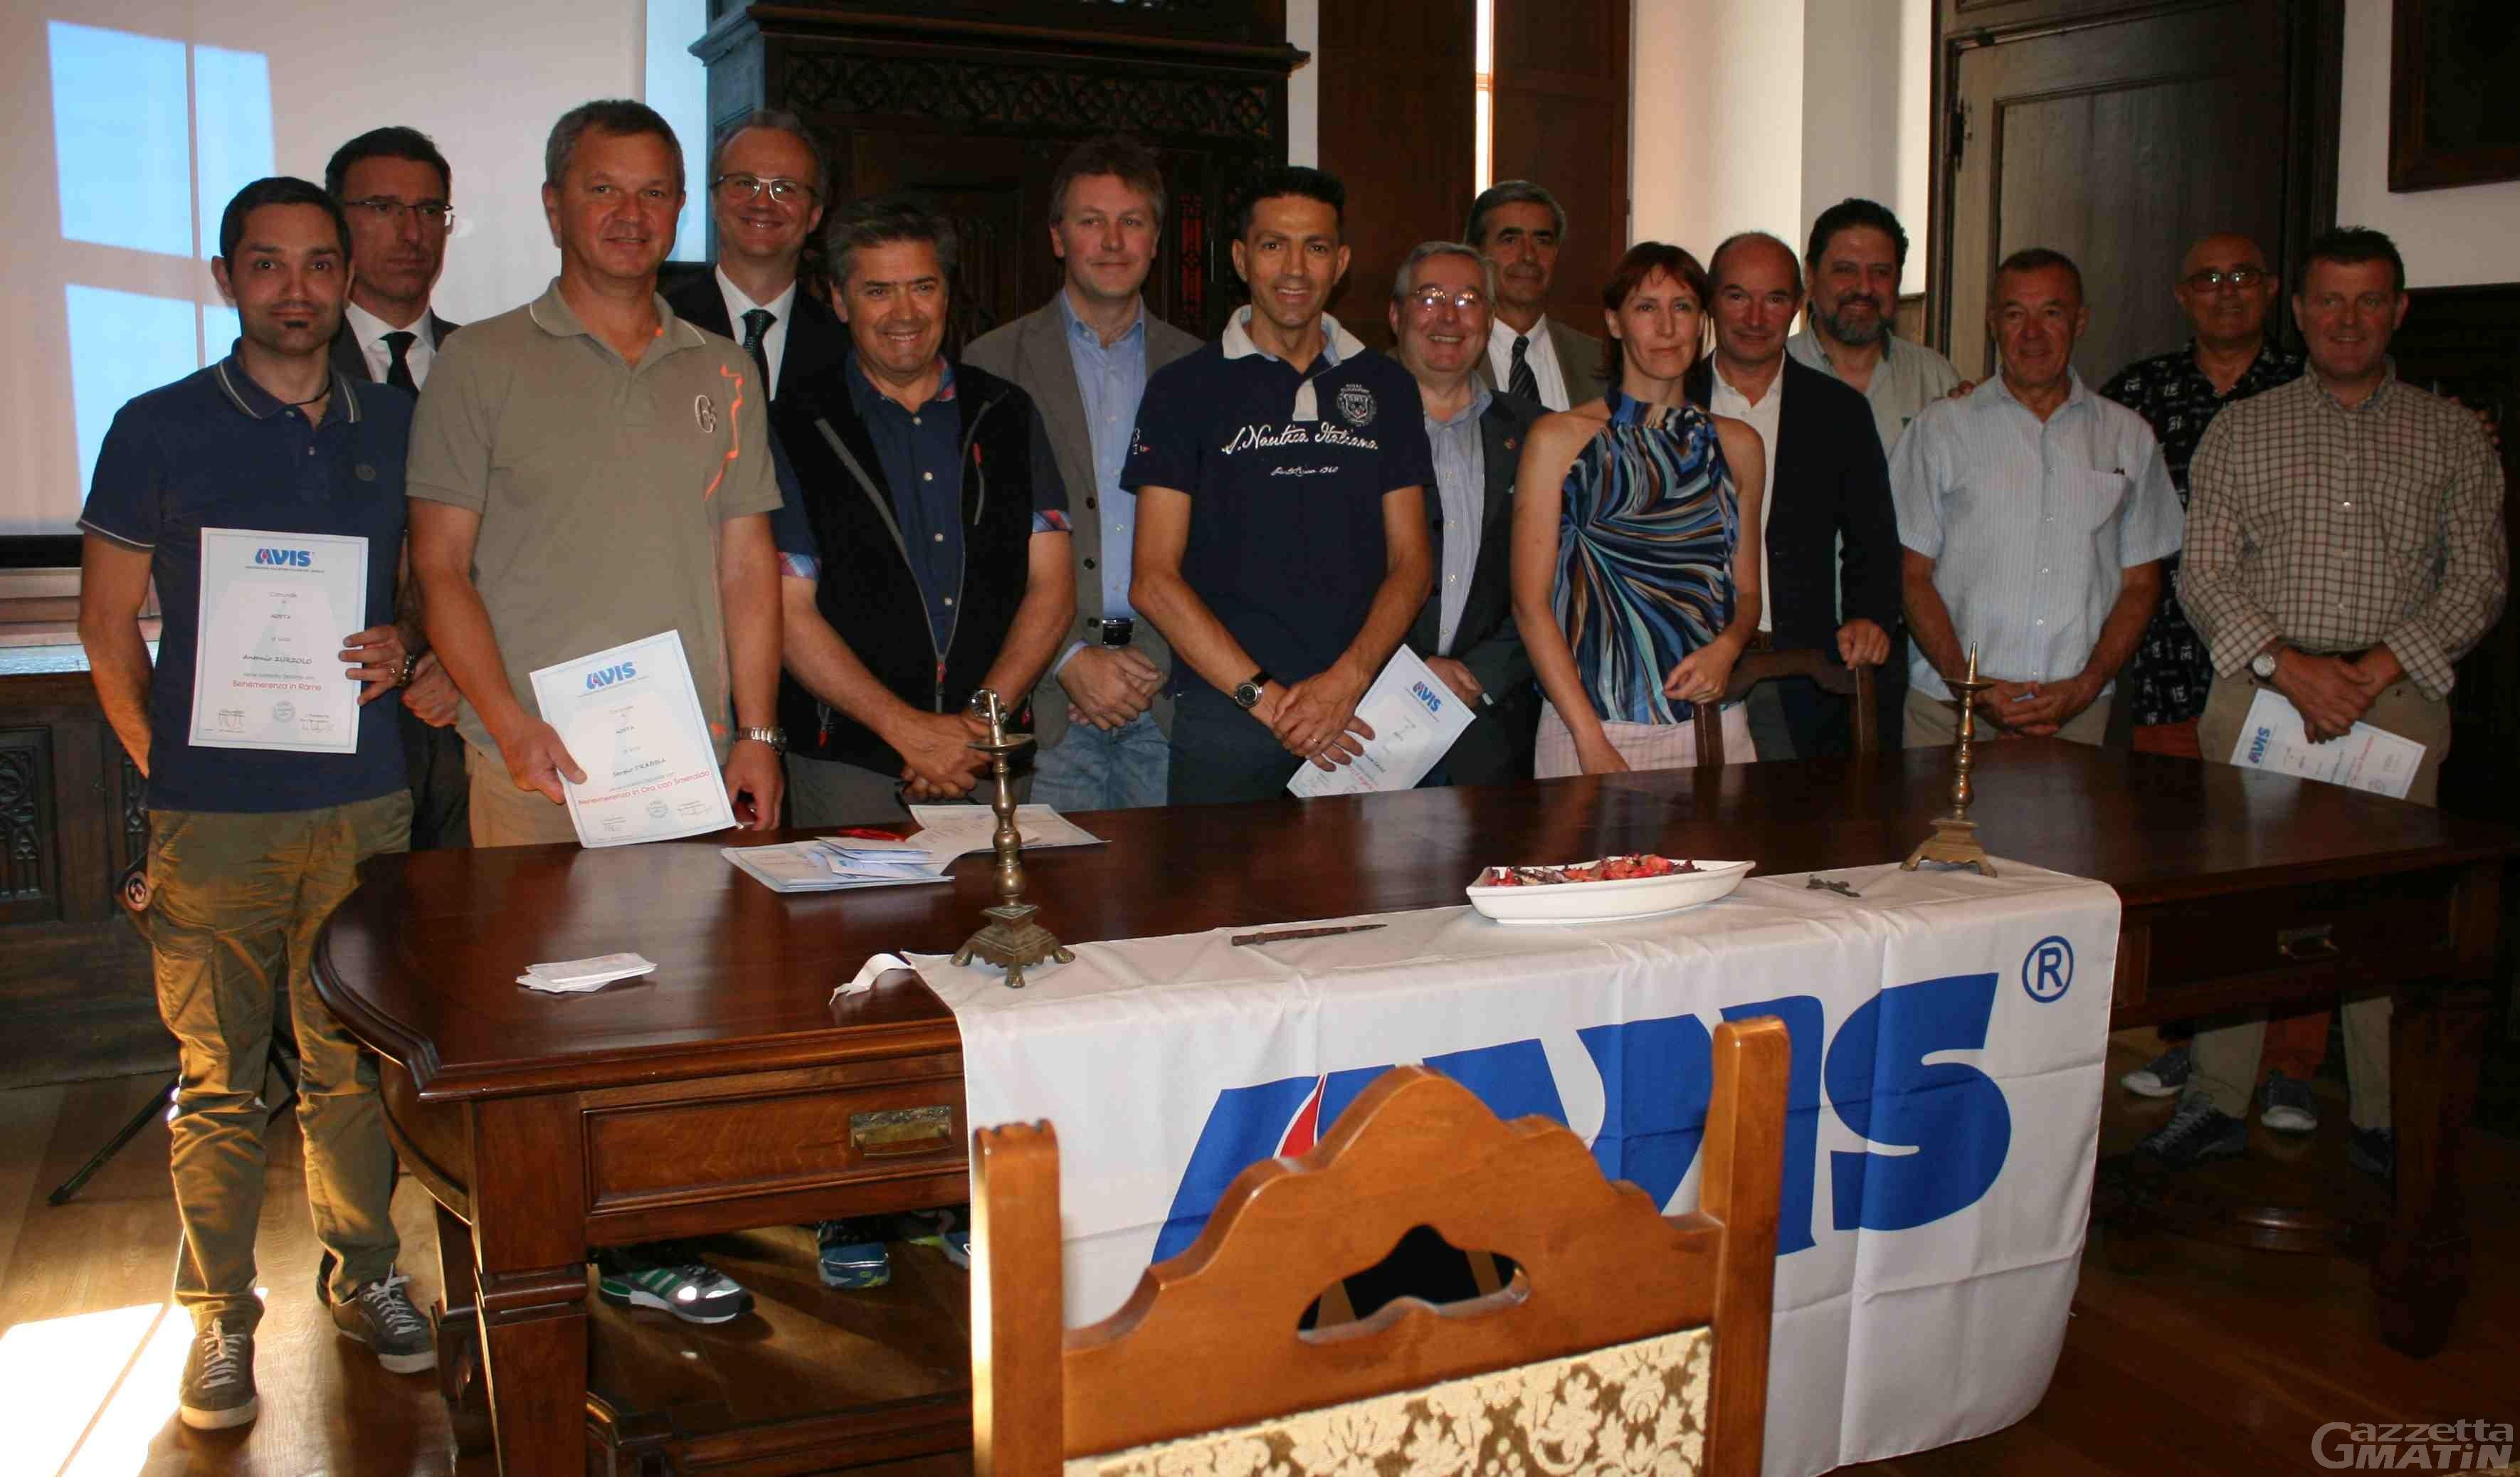 Donazione: l'Avis di Aosta supera i mille donatori attivi